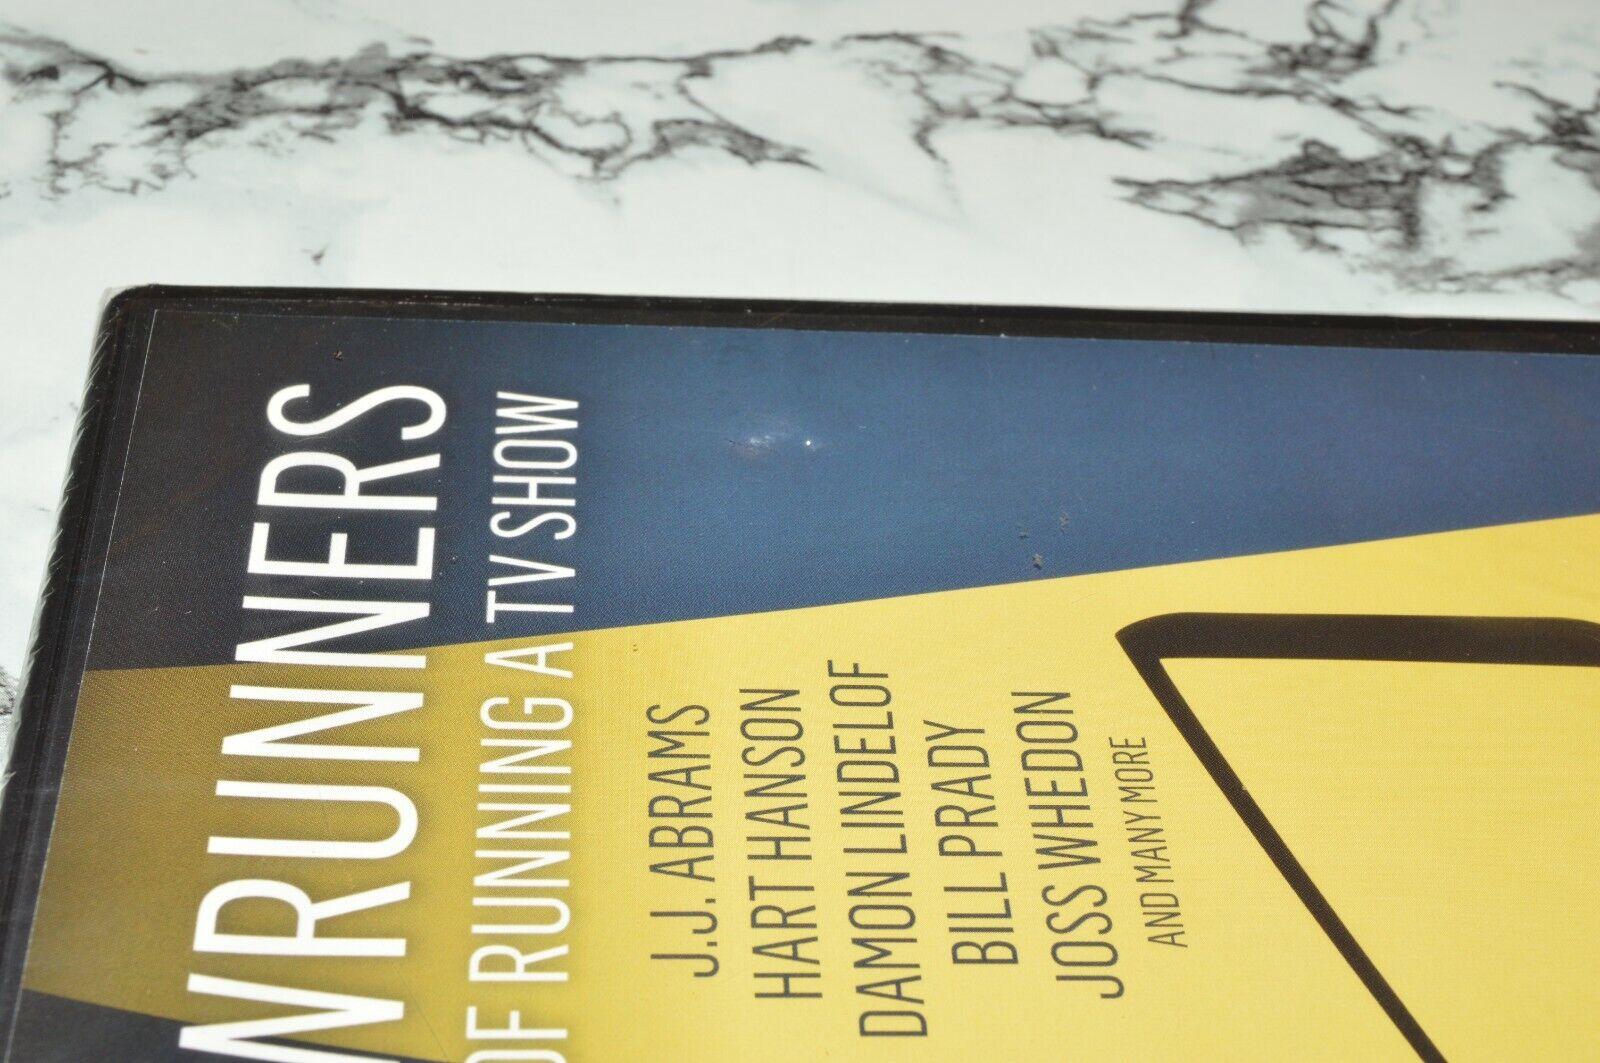 NEW - Showrunners - The Art Of Running A TV Show DVD, 2015 -- J.J. Abrams PBS - $12.68